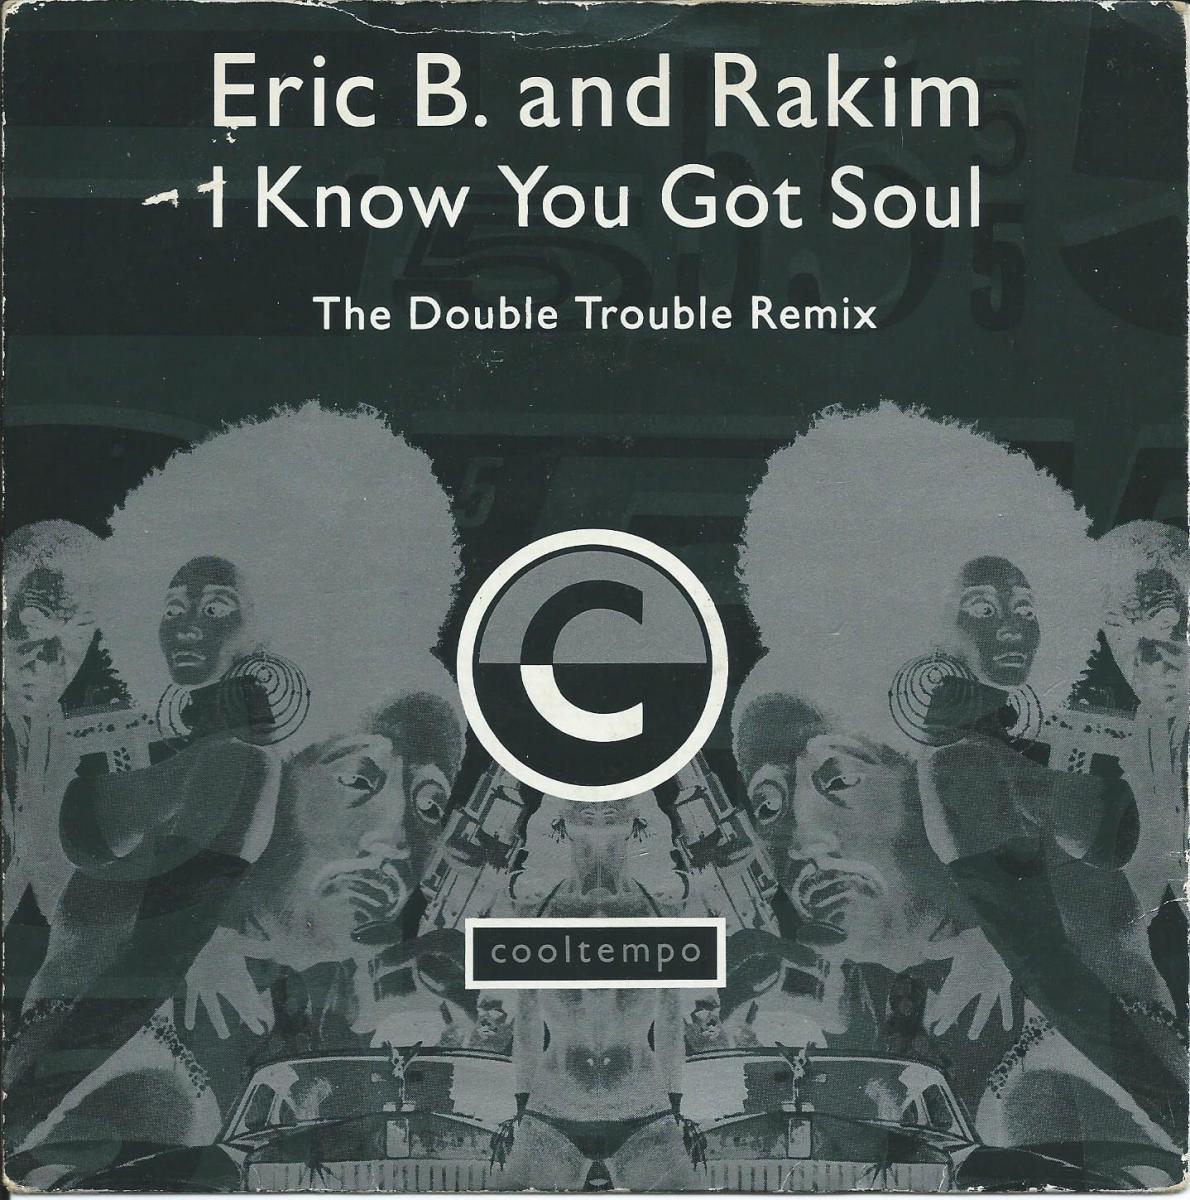 ERIC B. & RAKIM / I KNOW YOU GOT SOUL (THE DOUBLE TROUBLE REMIX) (7